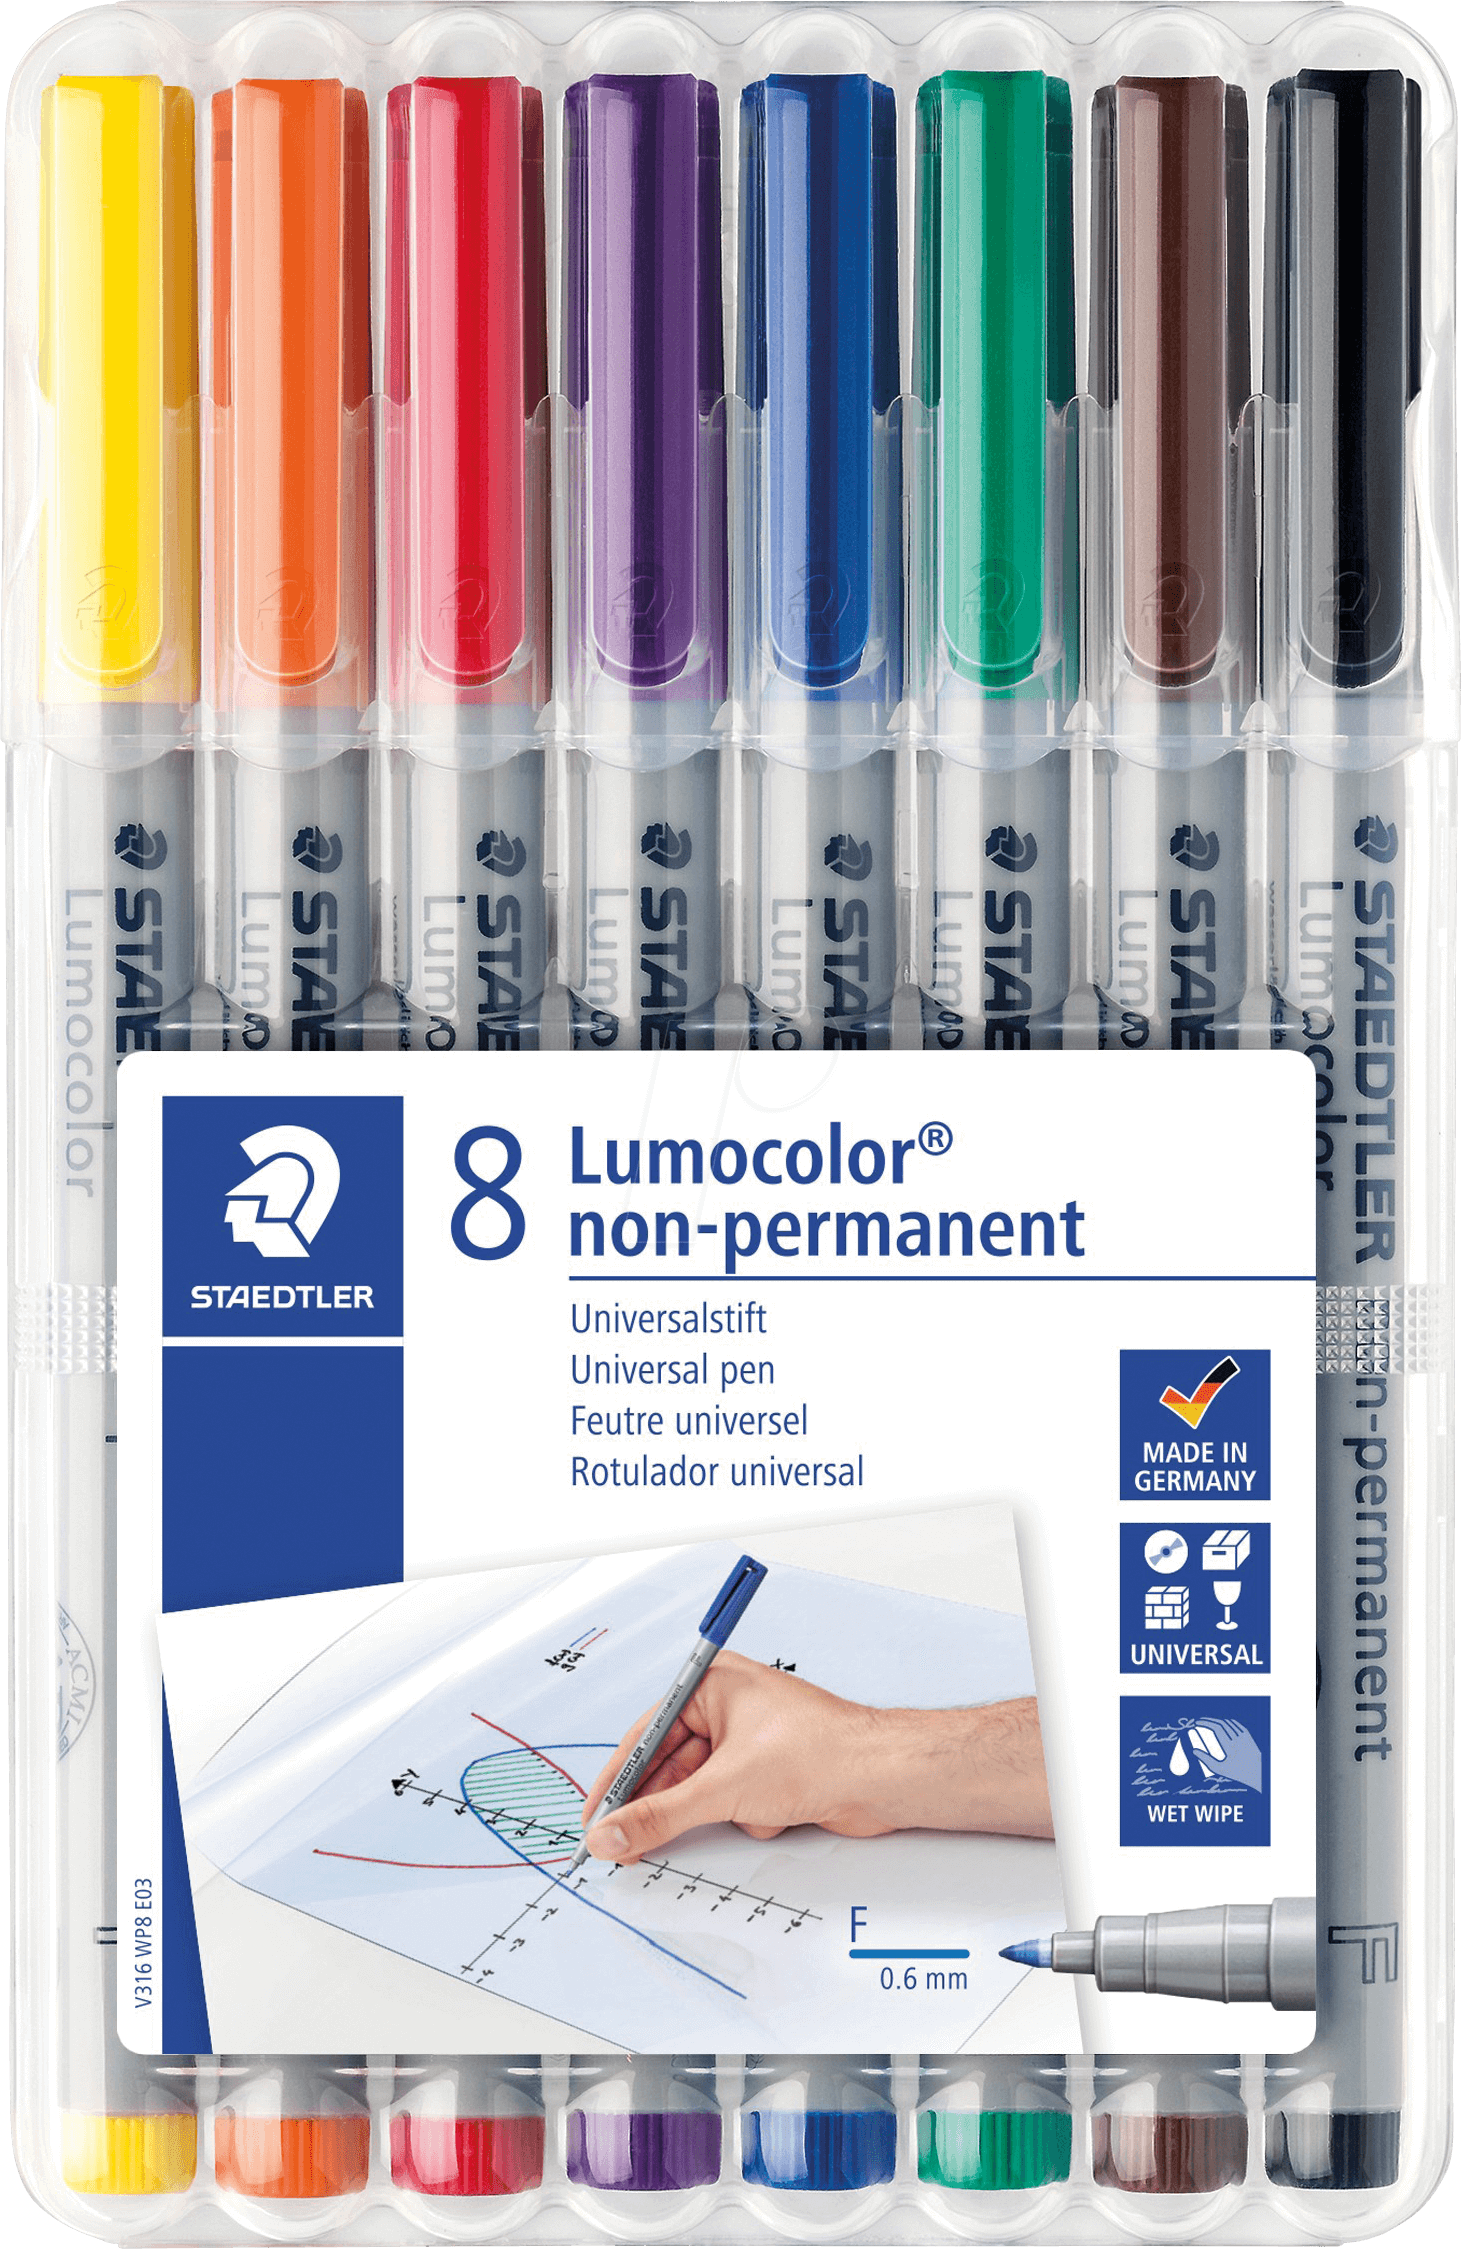 STAEDTLER 316WP8 - Lumocolor non-permanent Box mit 8 Farben, F 0,6 mm